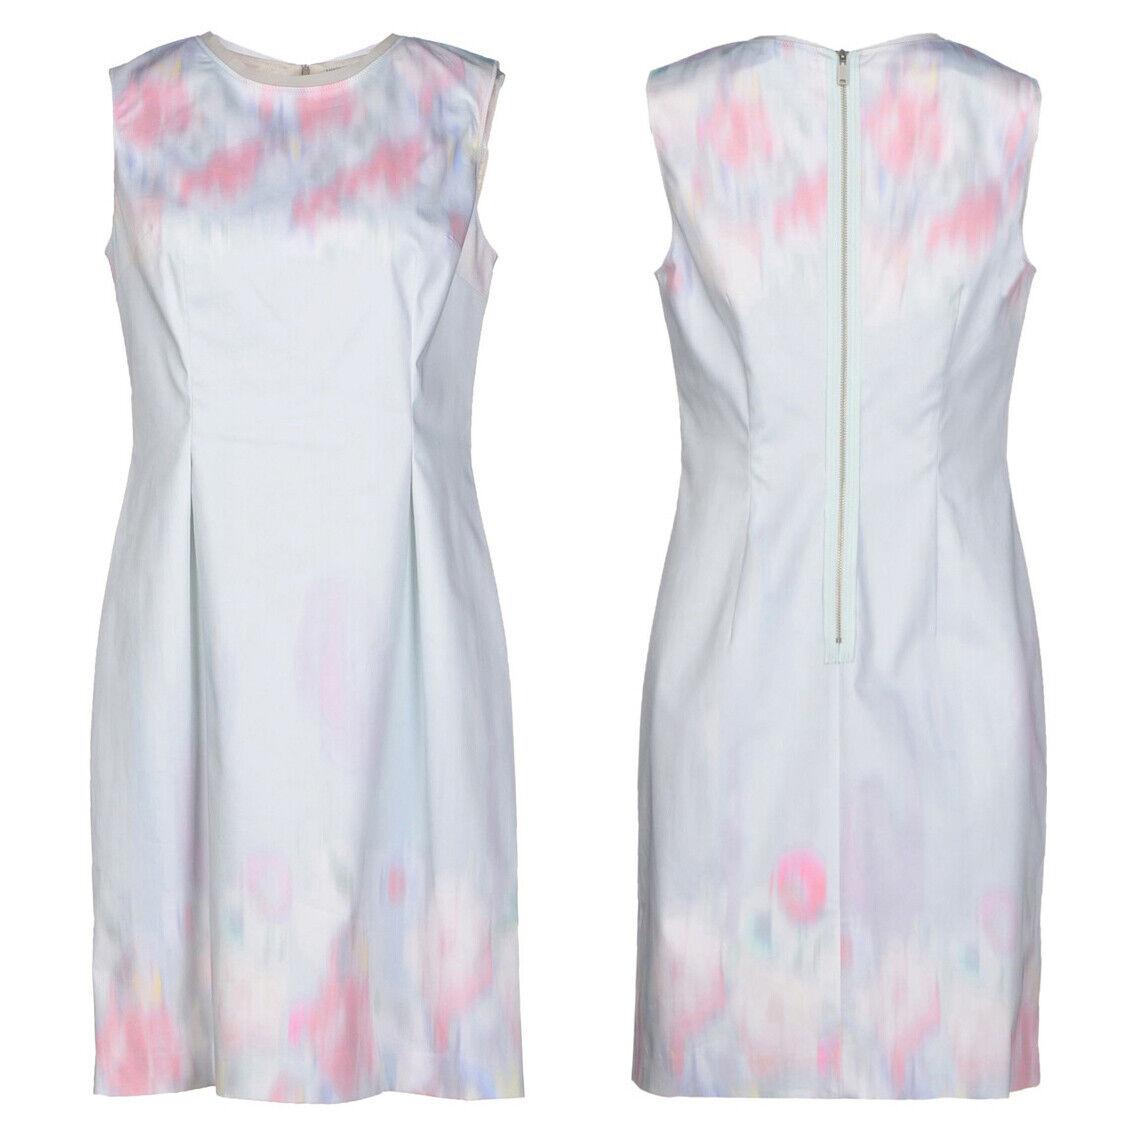 ELIE TAHARI Soft Sky Blau WaterFarbe Pastel Garden Party HOLLY Sheath Dress NWT